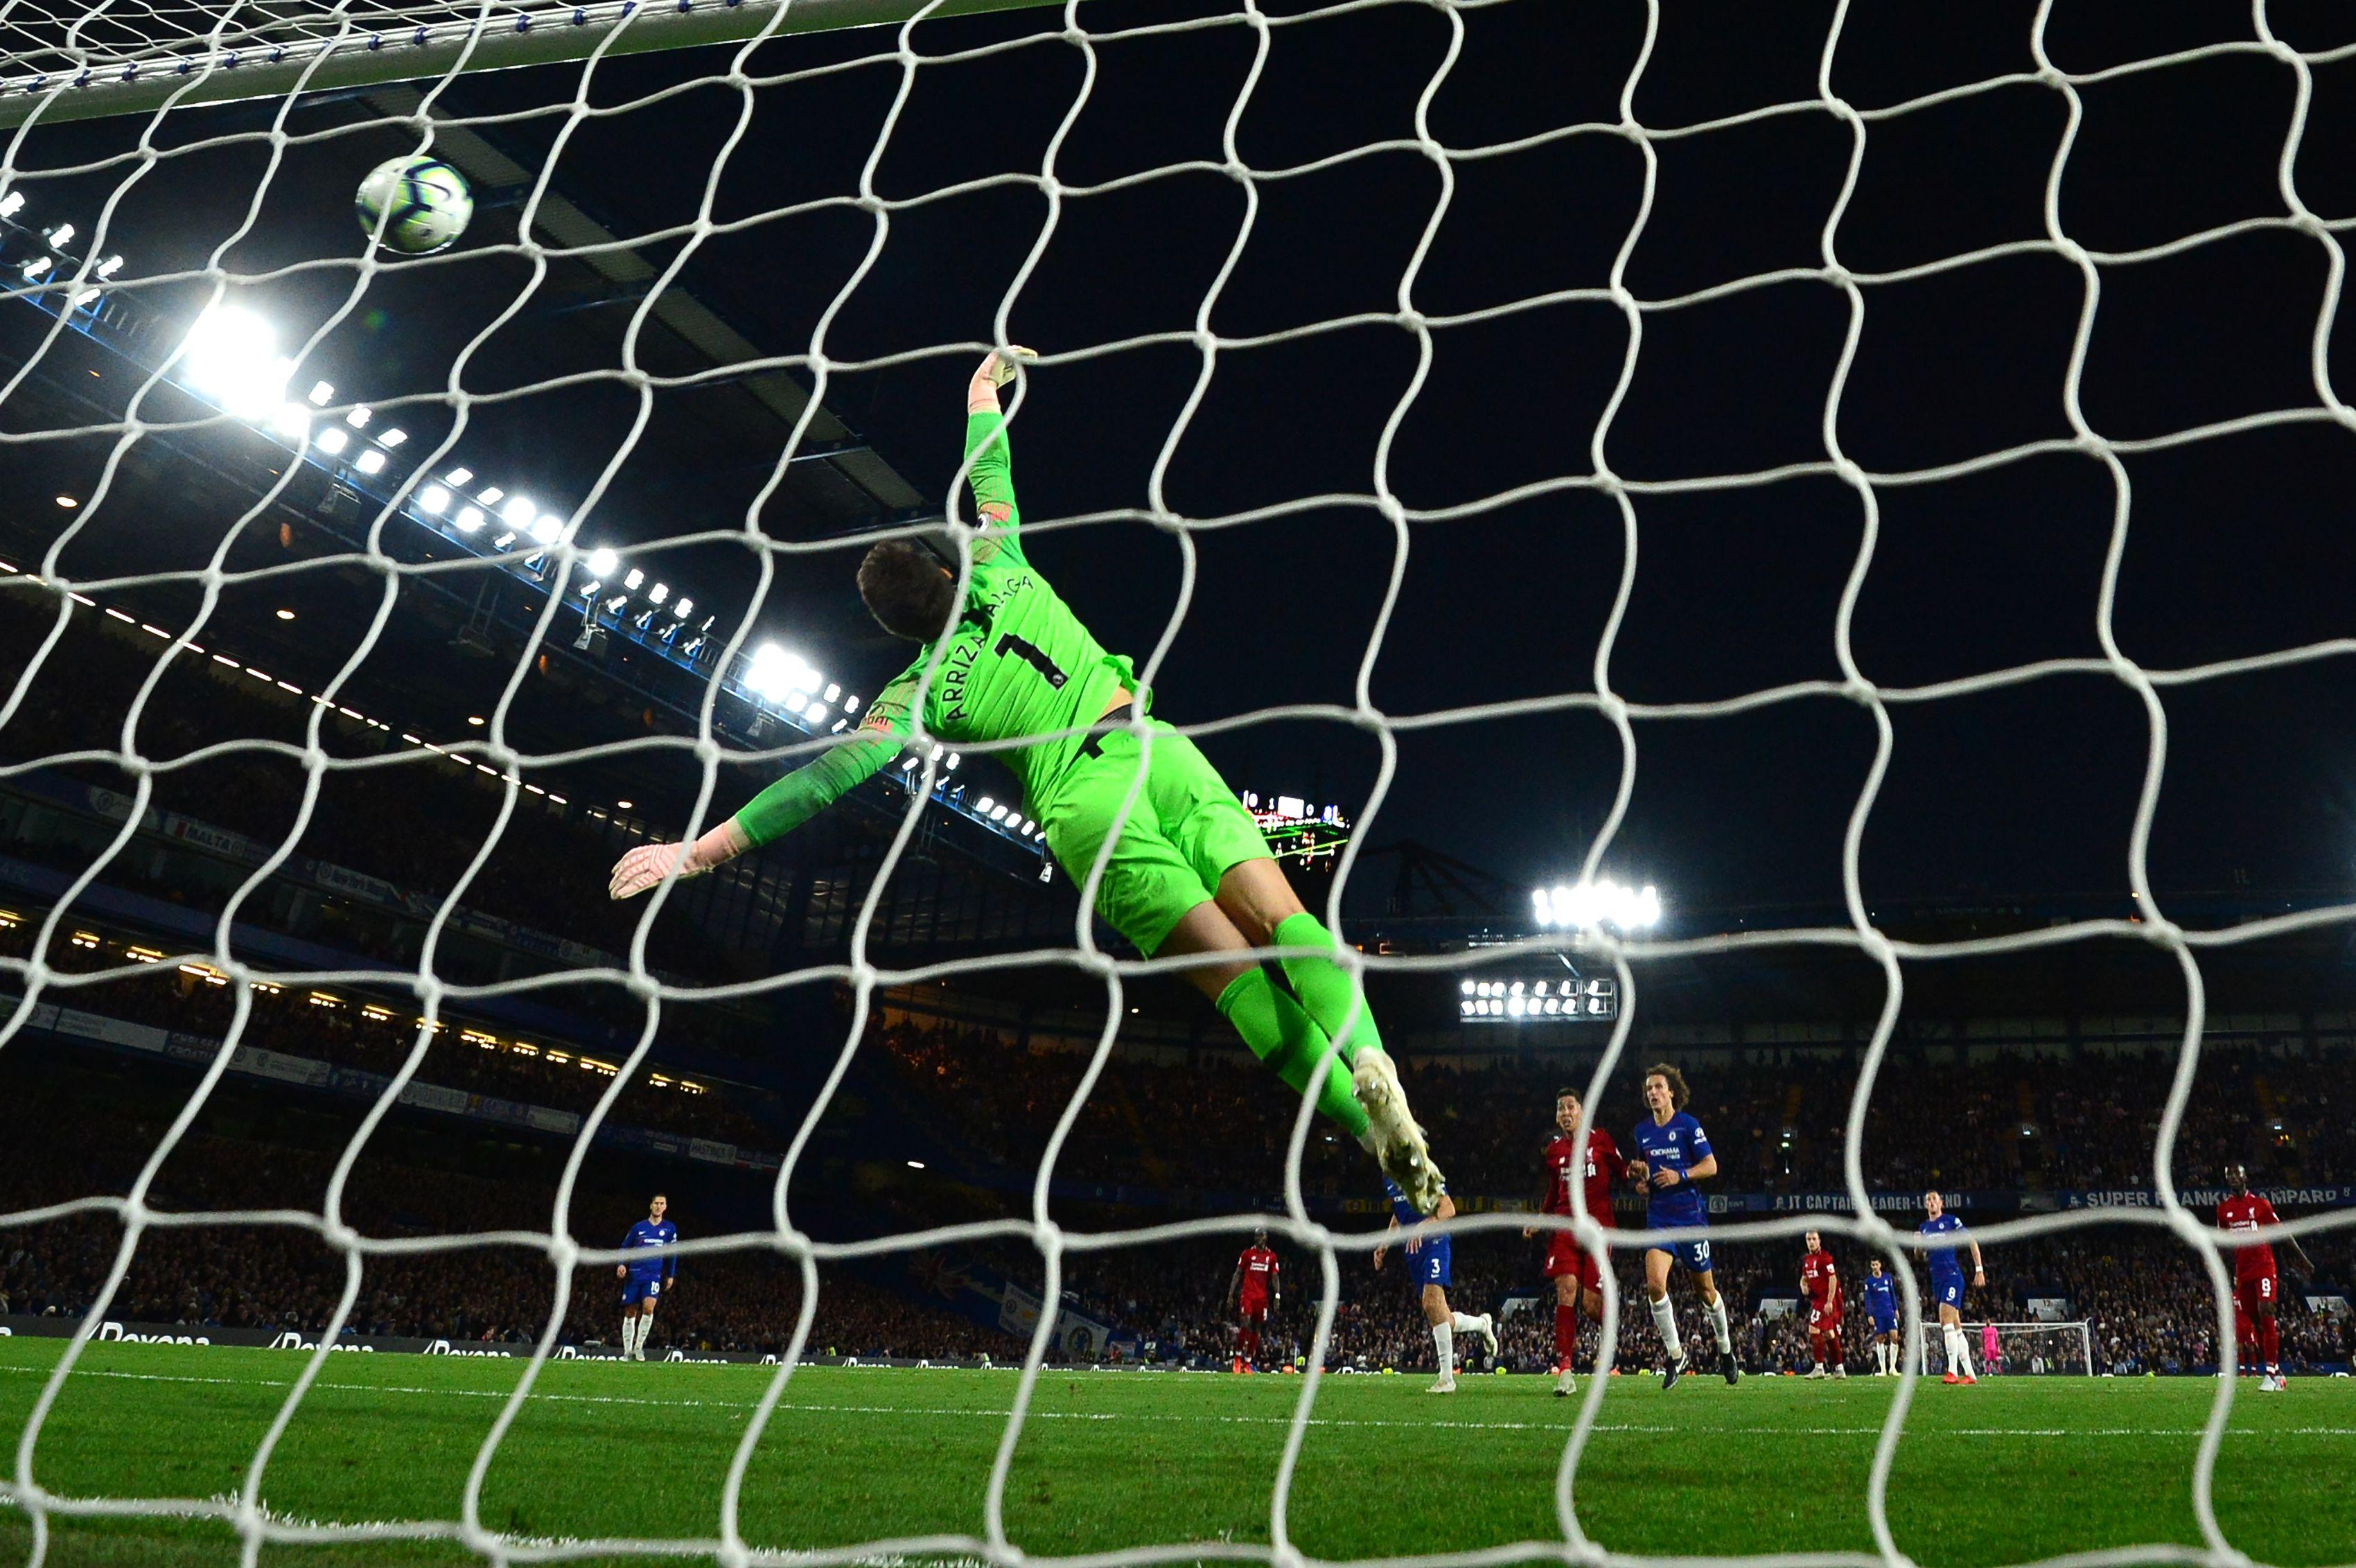 Daniel Sturridge thumped the ball sweetly past Kepa Arrizabalaga from distance